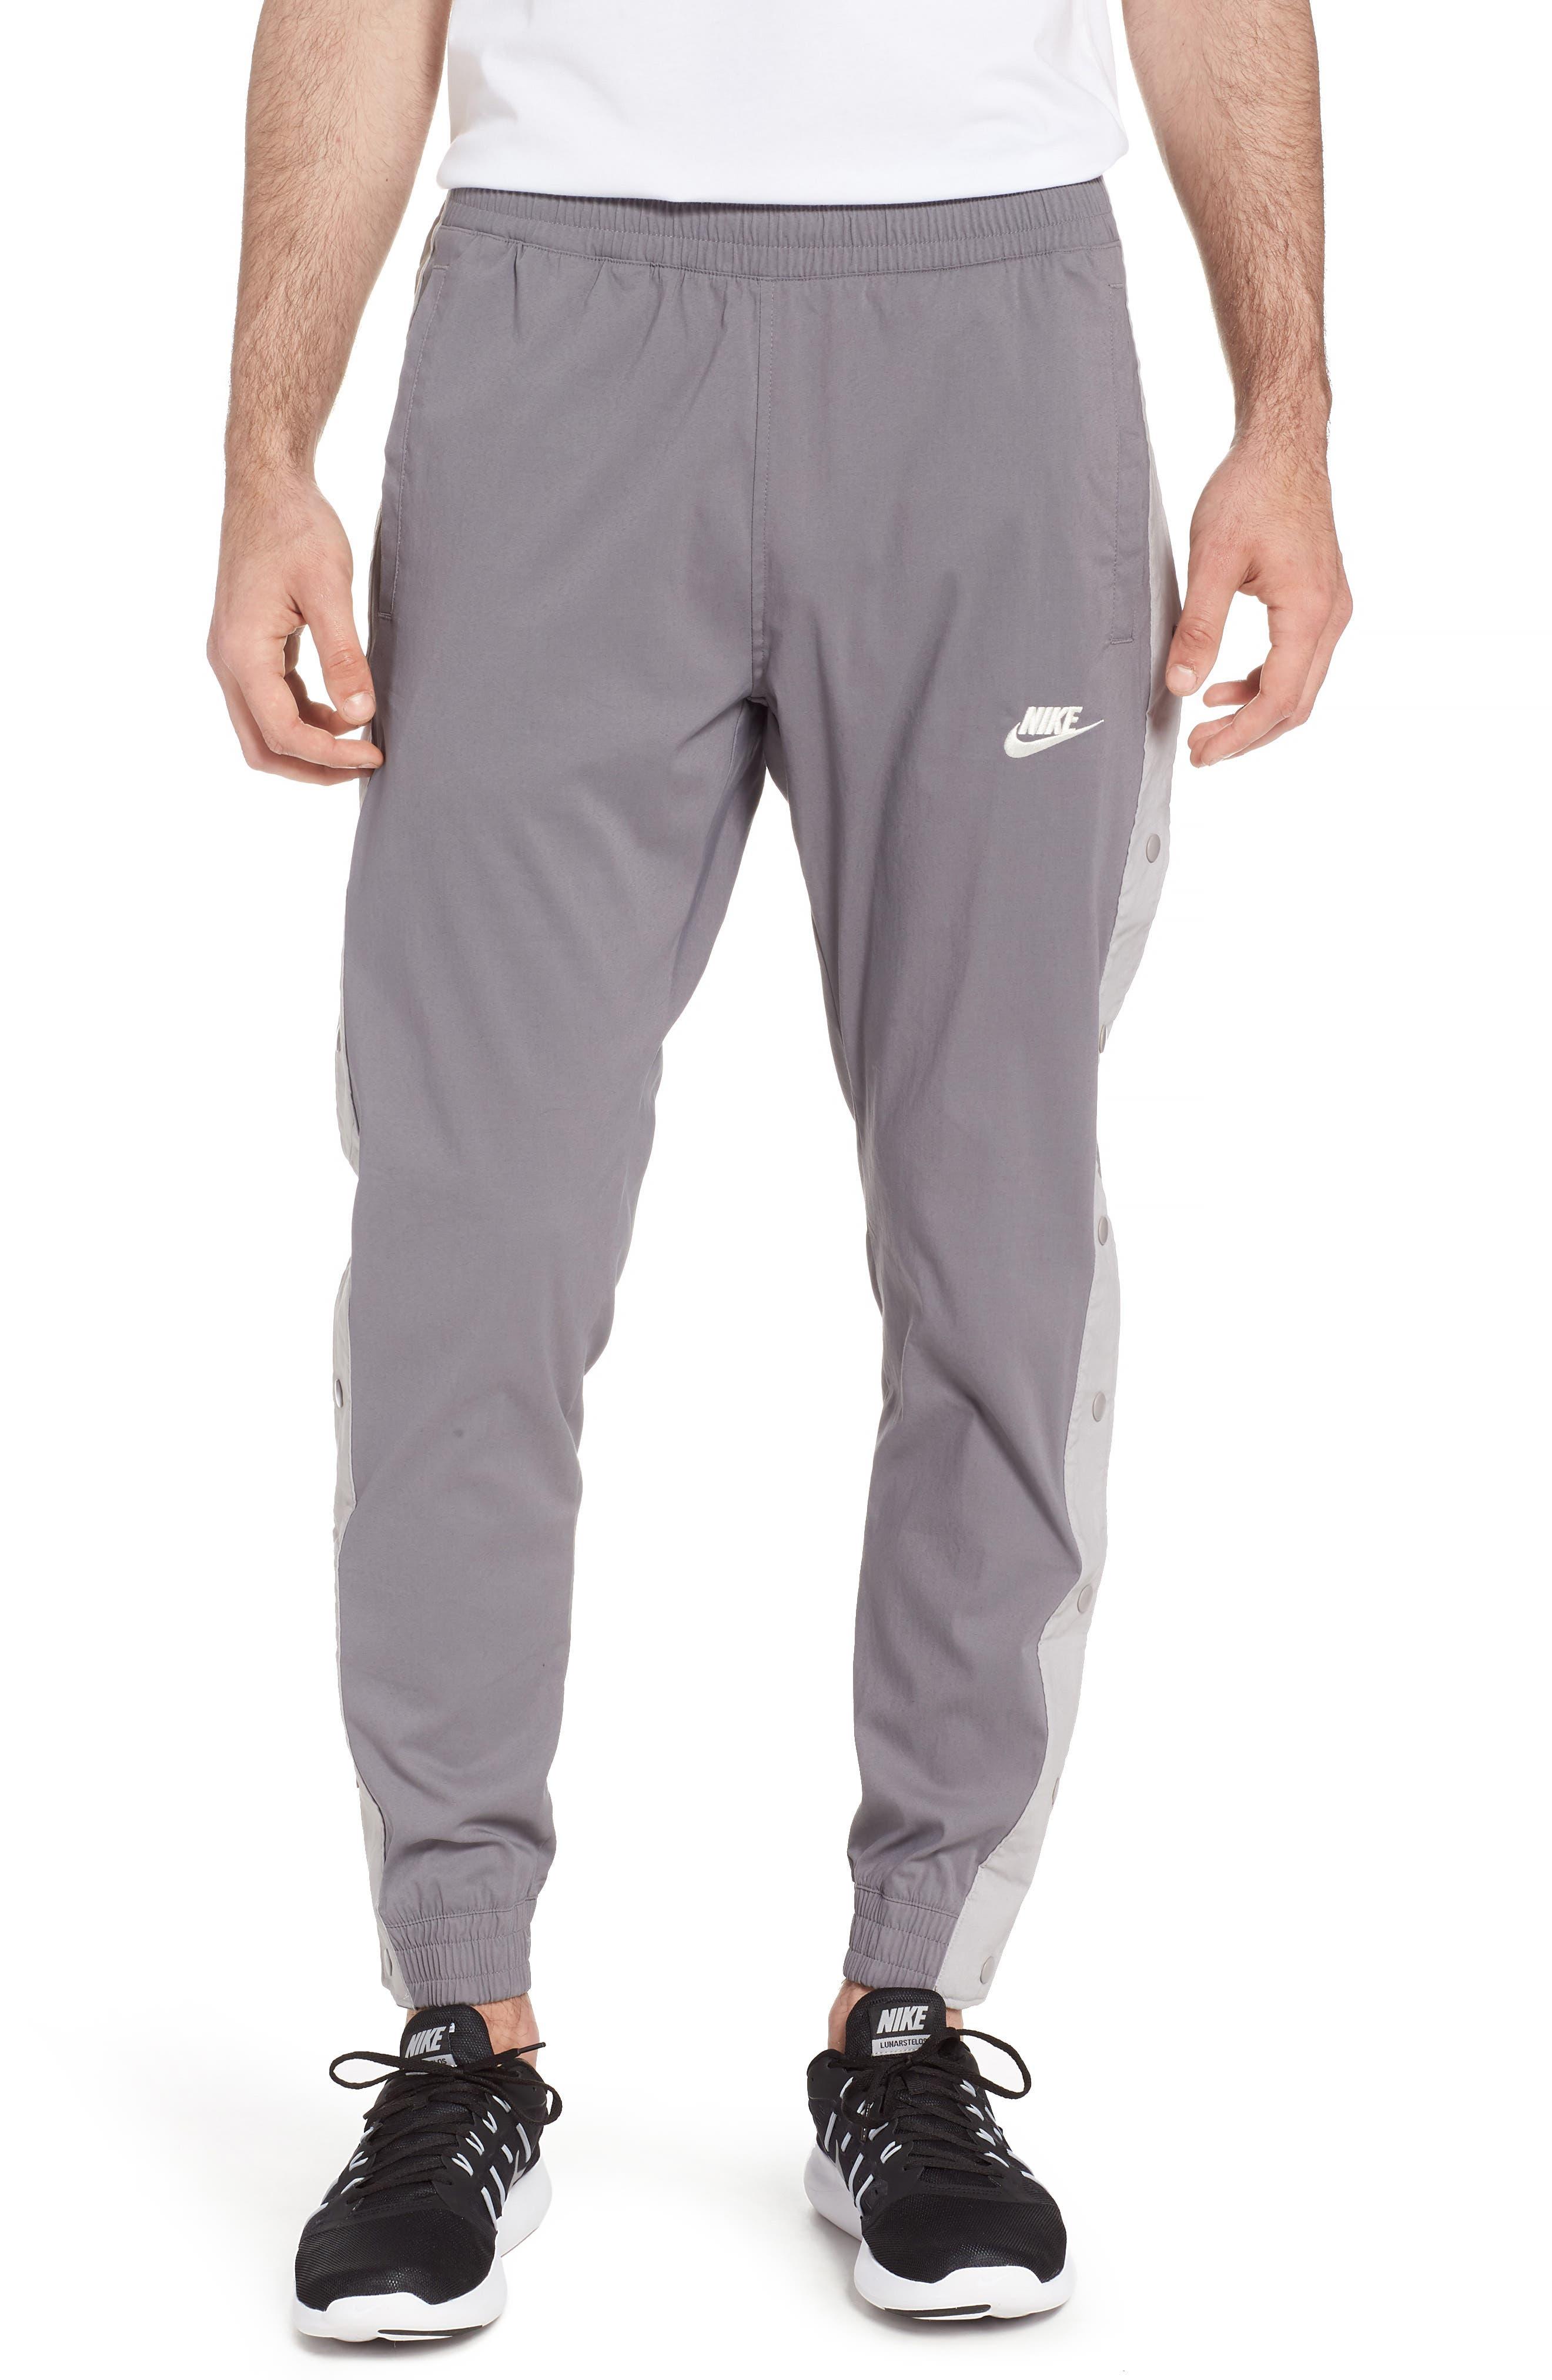 NSW Air Force 1 Lounge Pants,                             Main thumbnail 1, color,                             Gunsmoke/ Grey/ Orewood